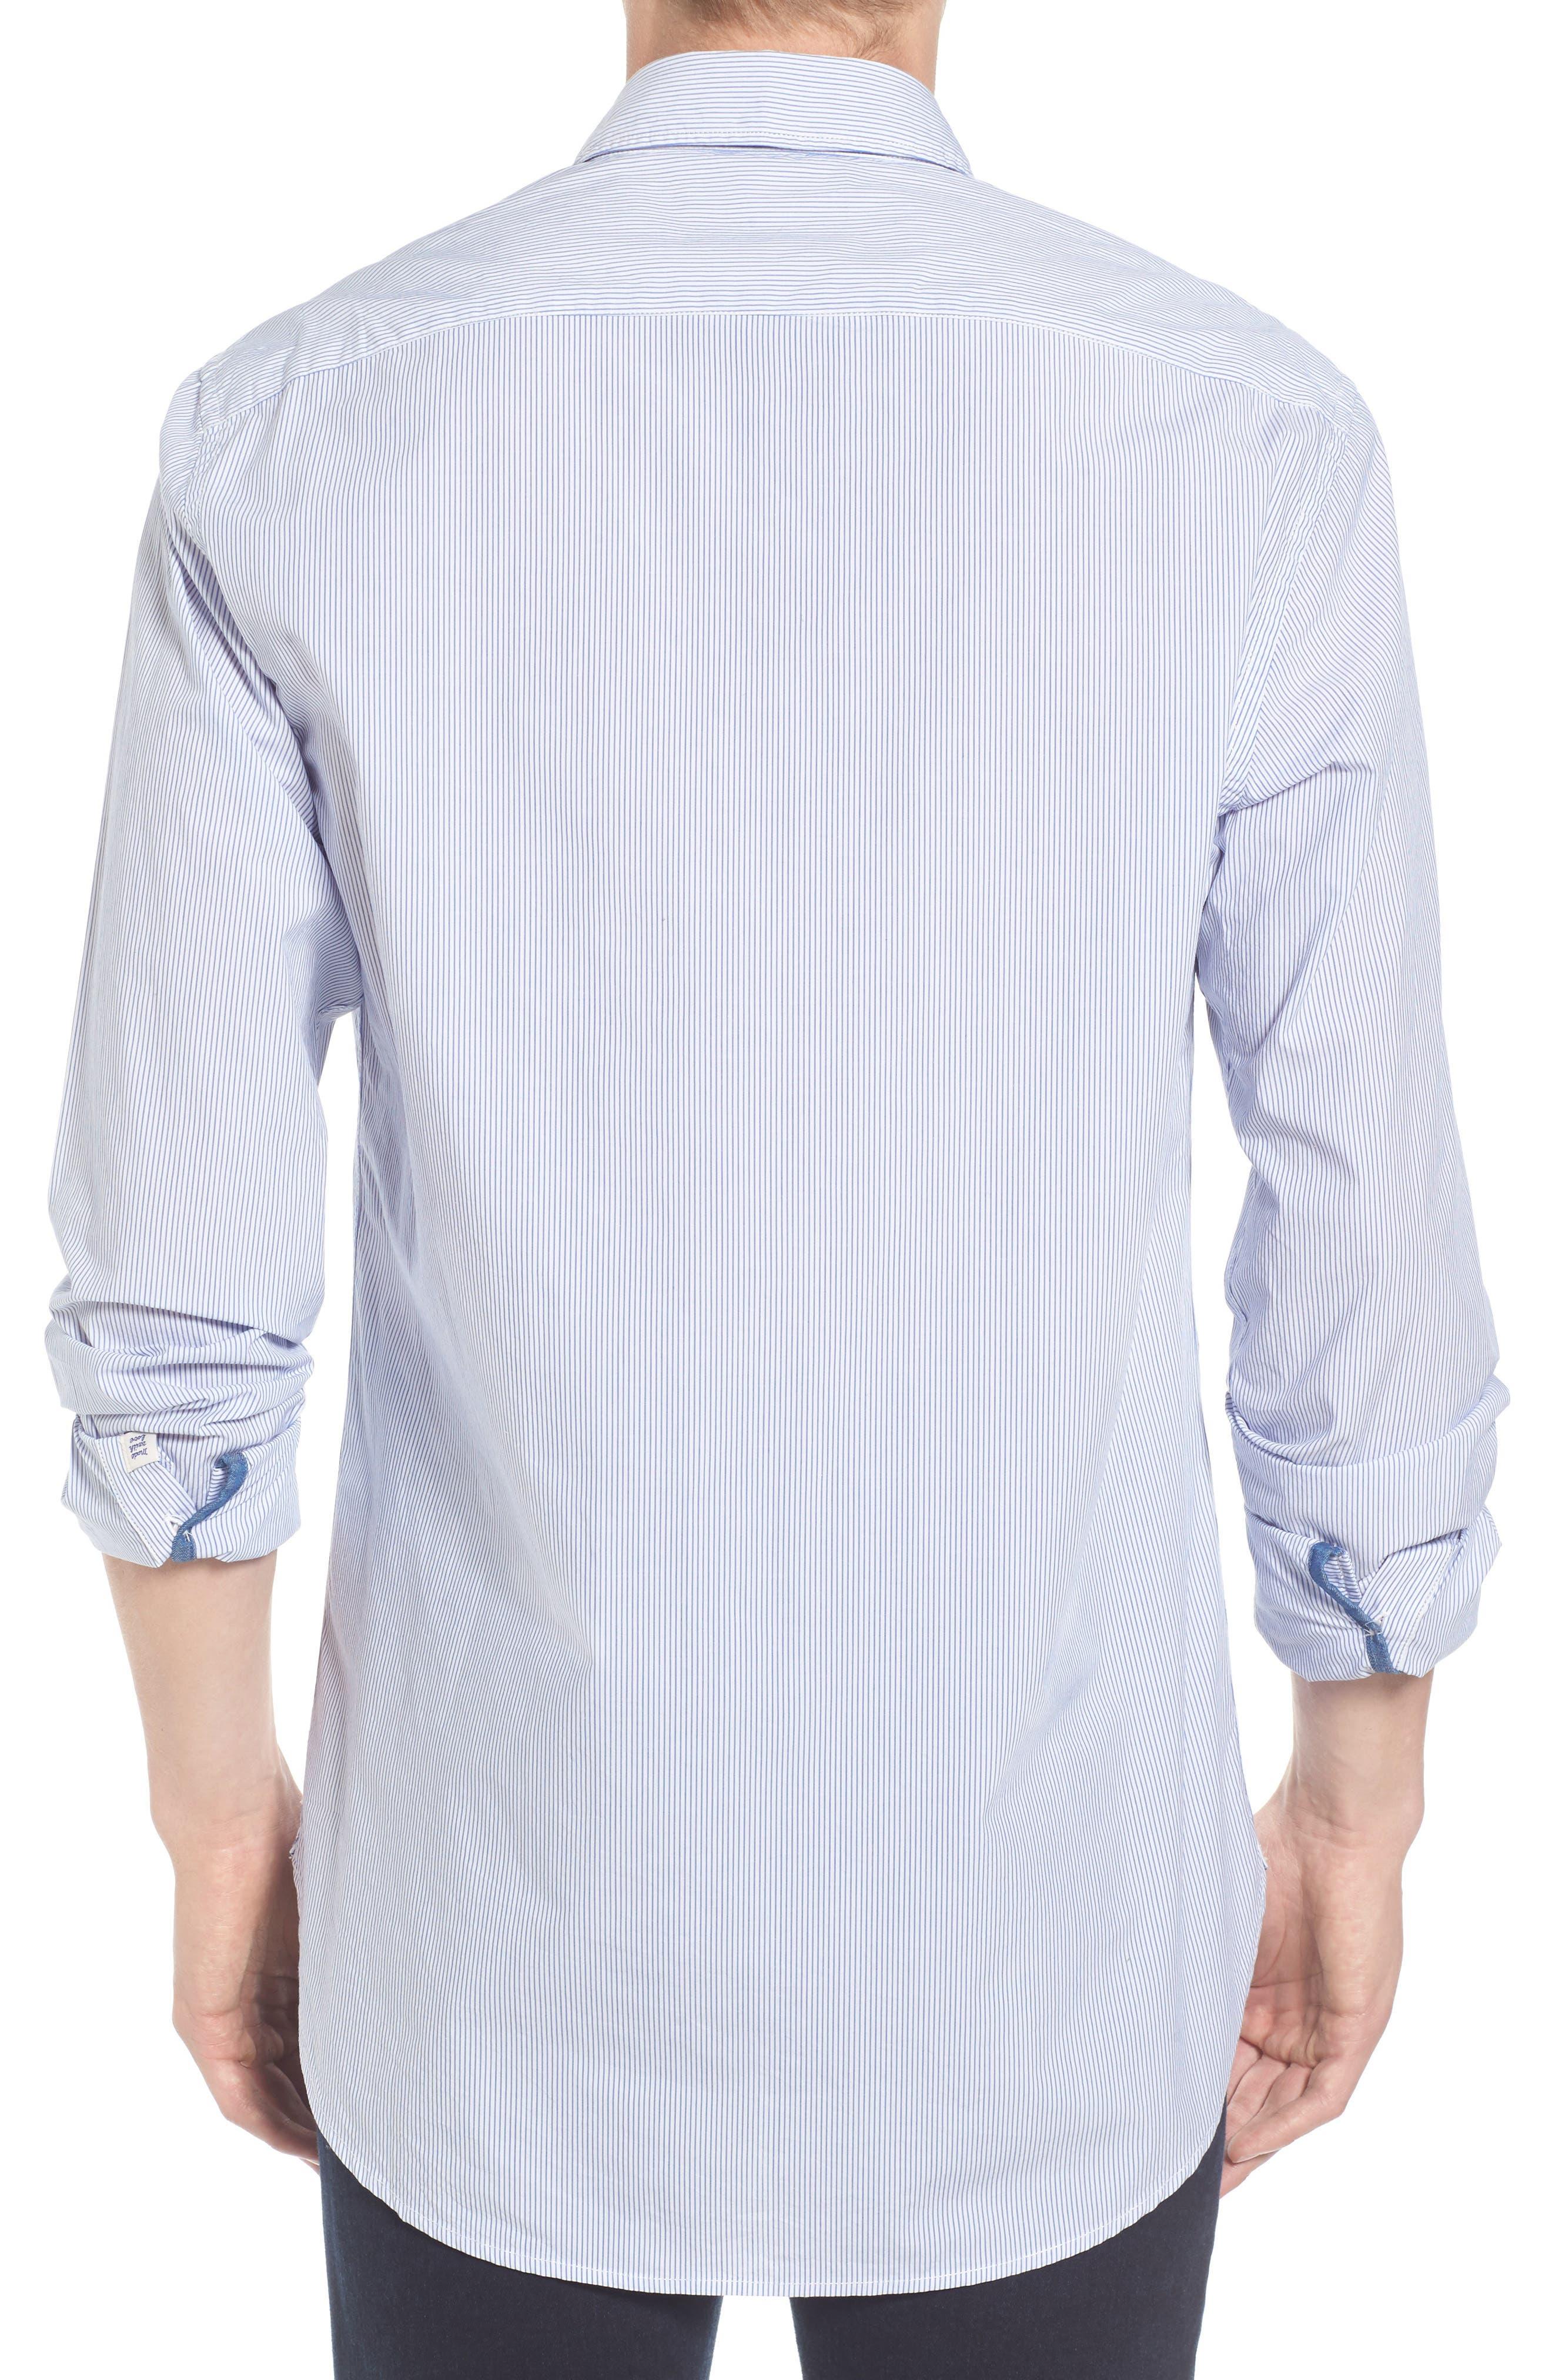 Alternate Image 2  - Scotch & Soda Woven Stripe Shirt